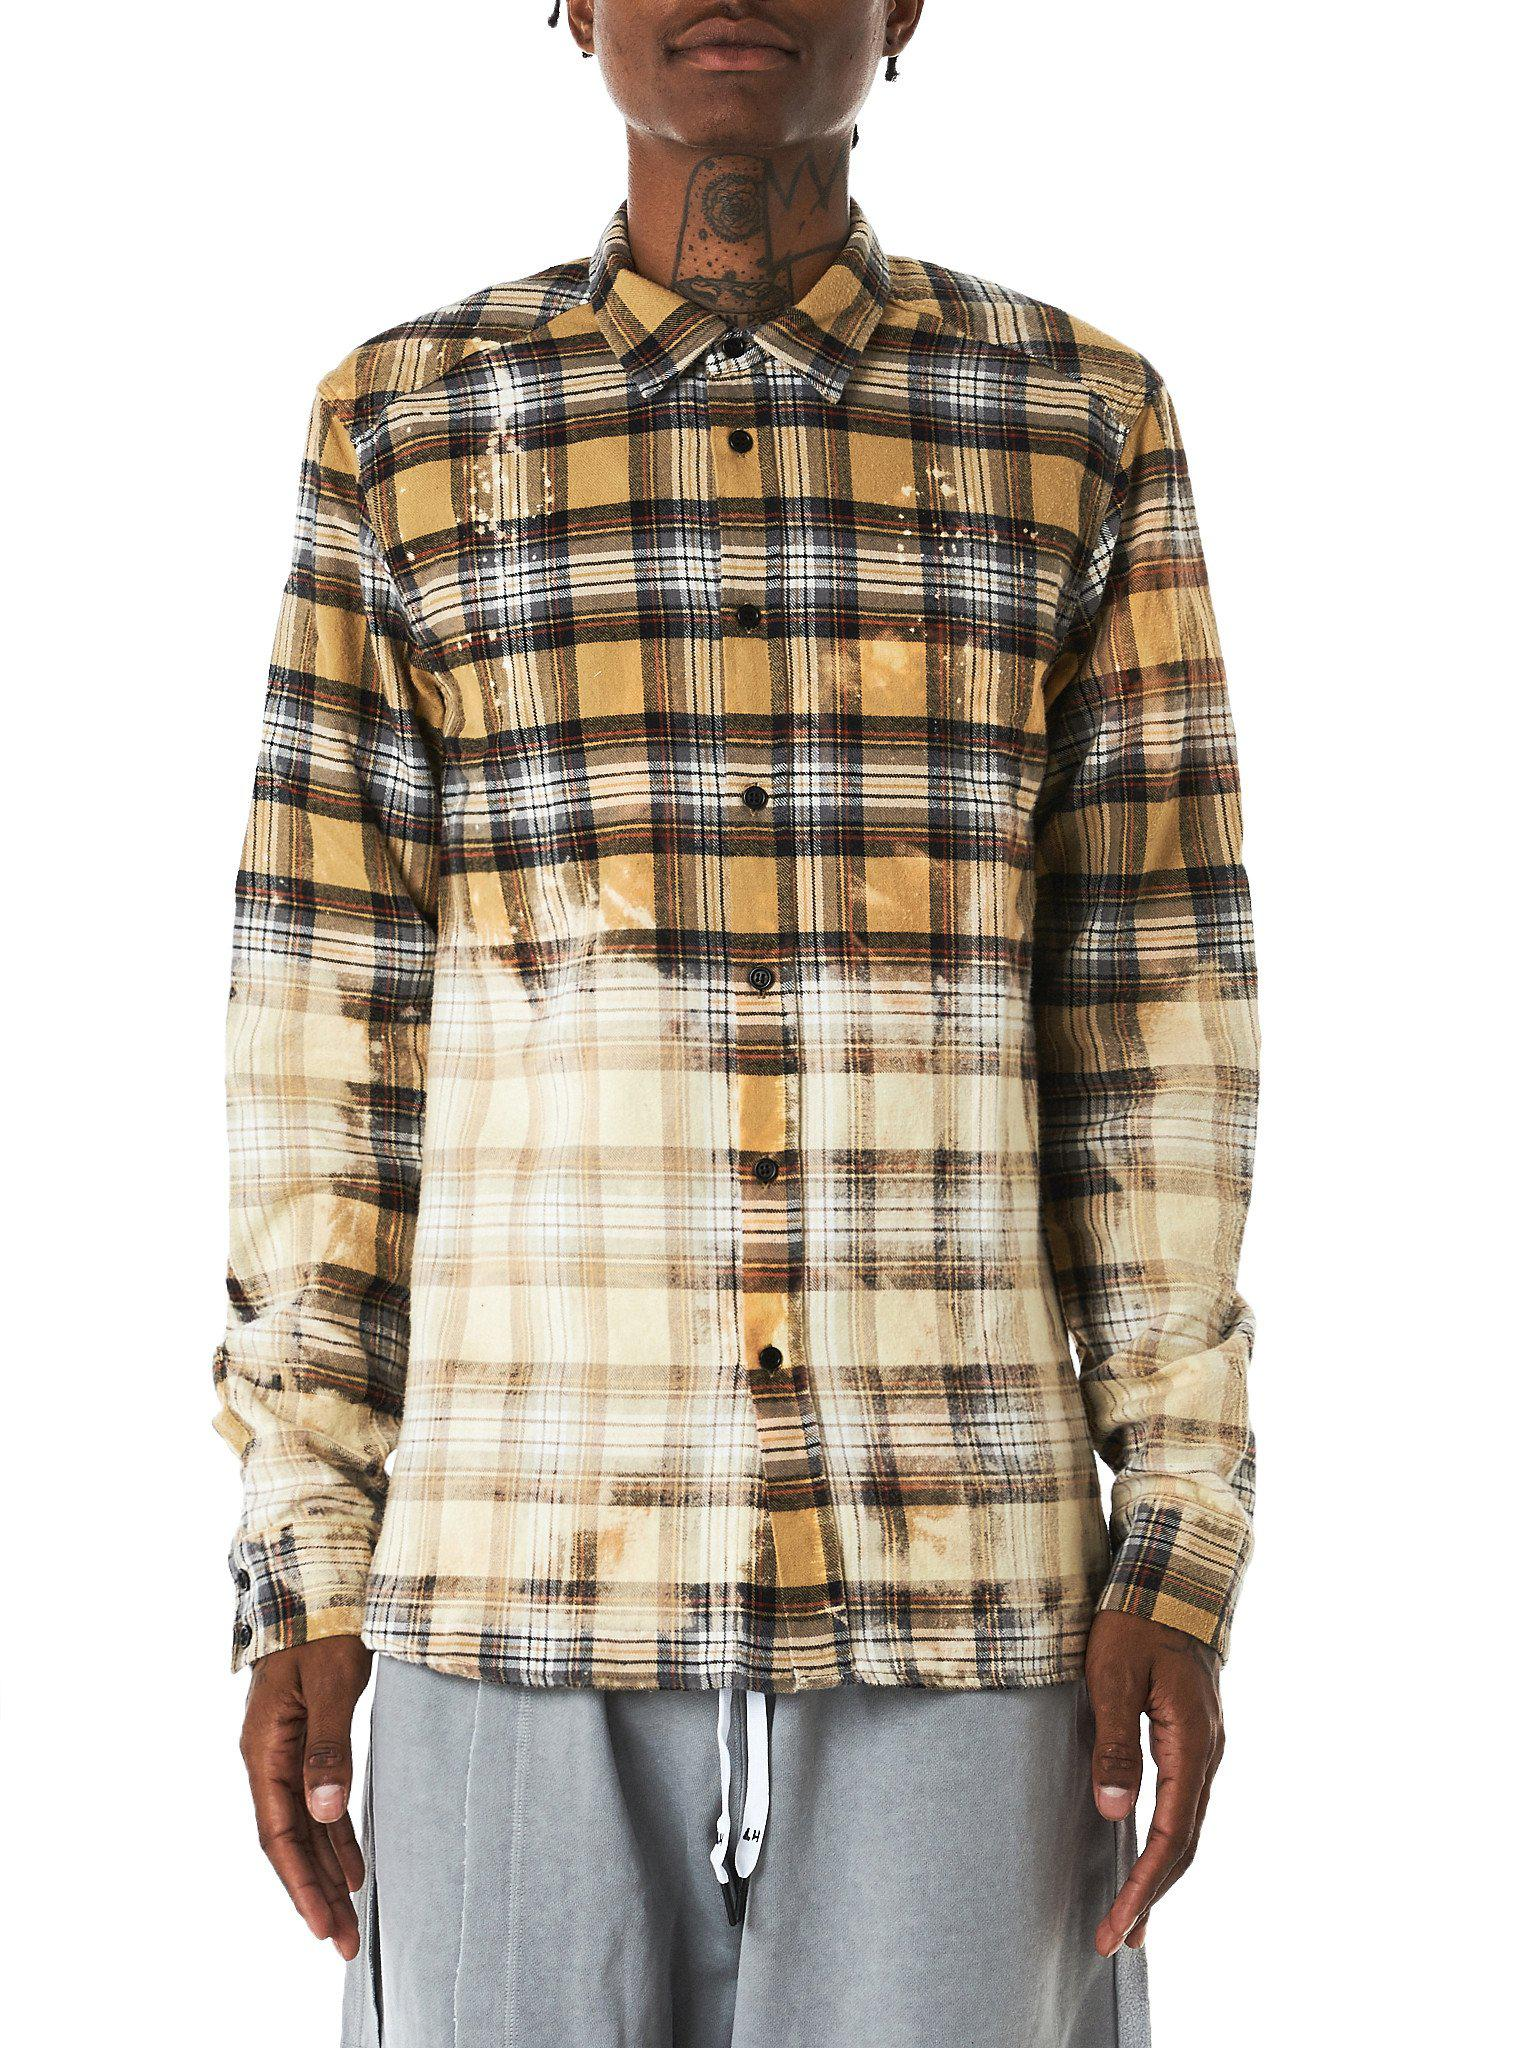 b04bfc58930e Lyst - Faith Connexion Bleached Flannel Shirt in Natural for Men